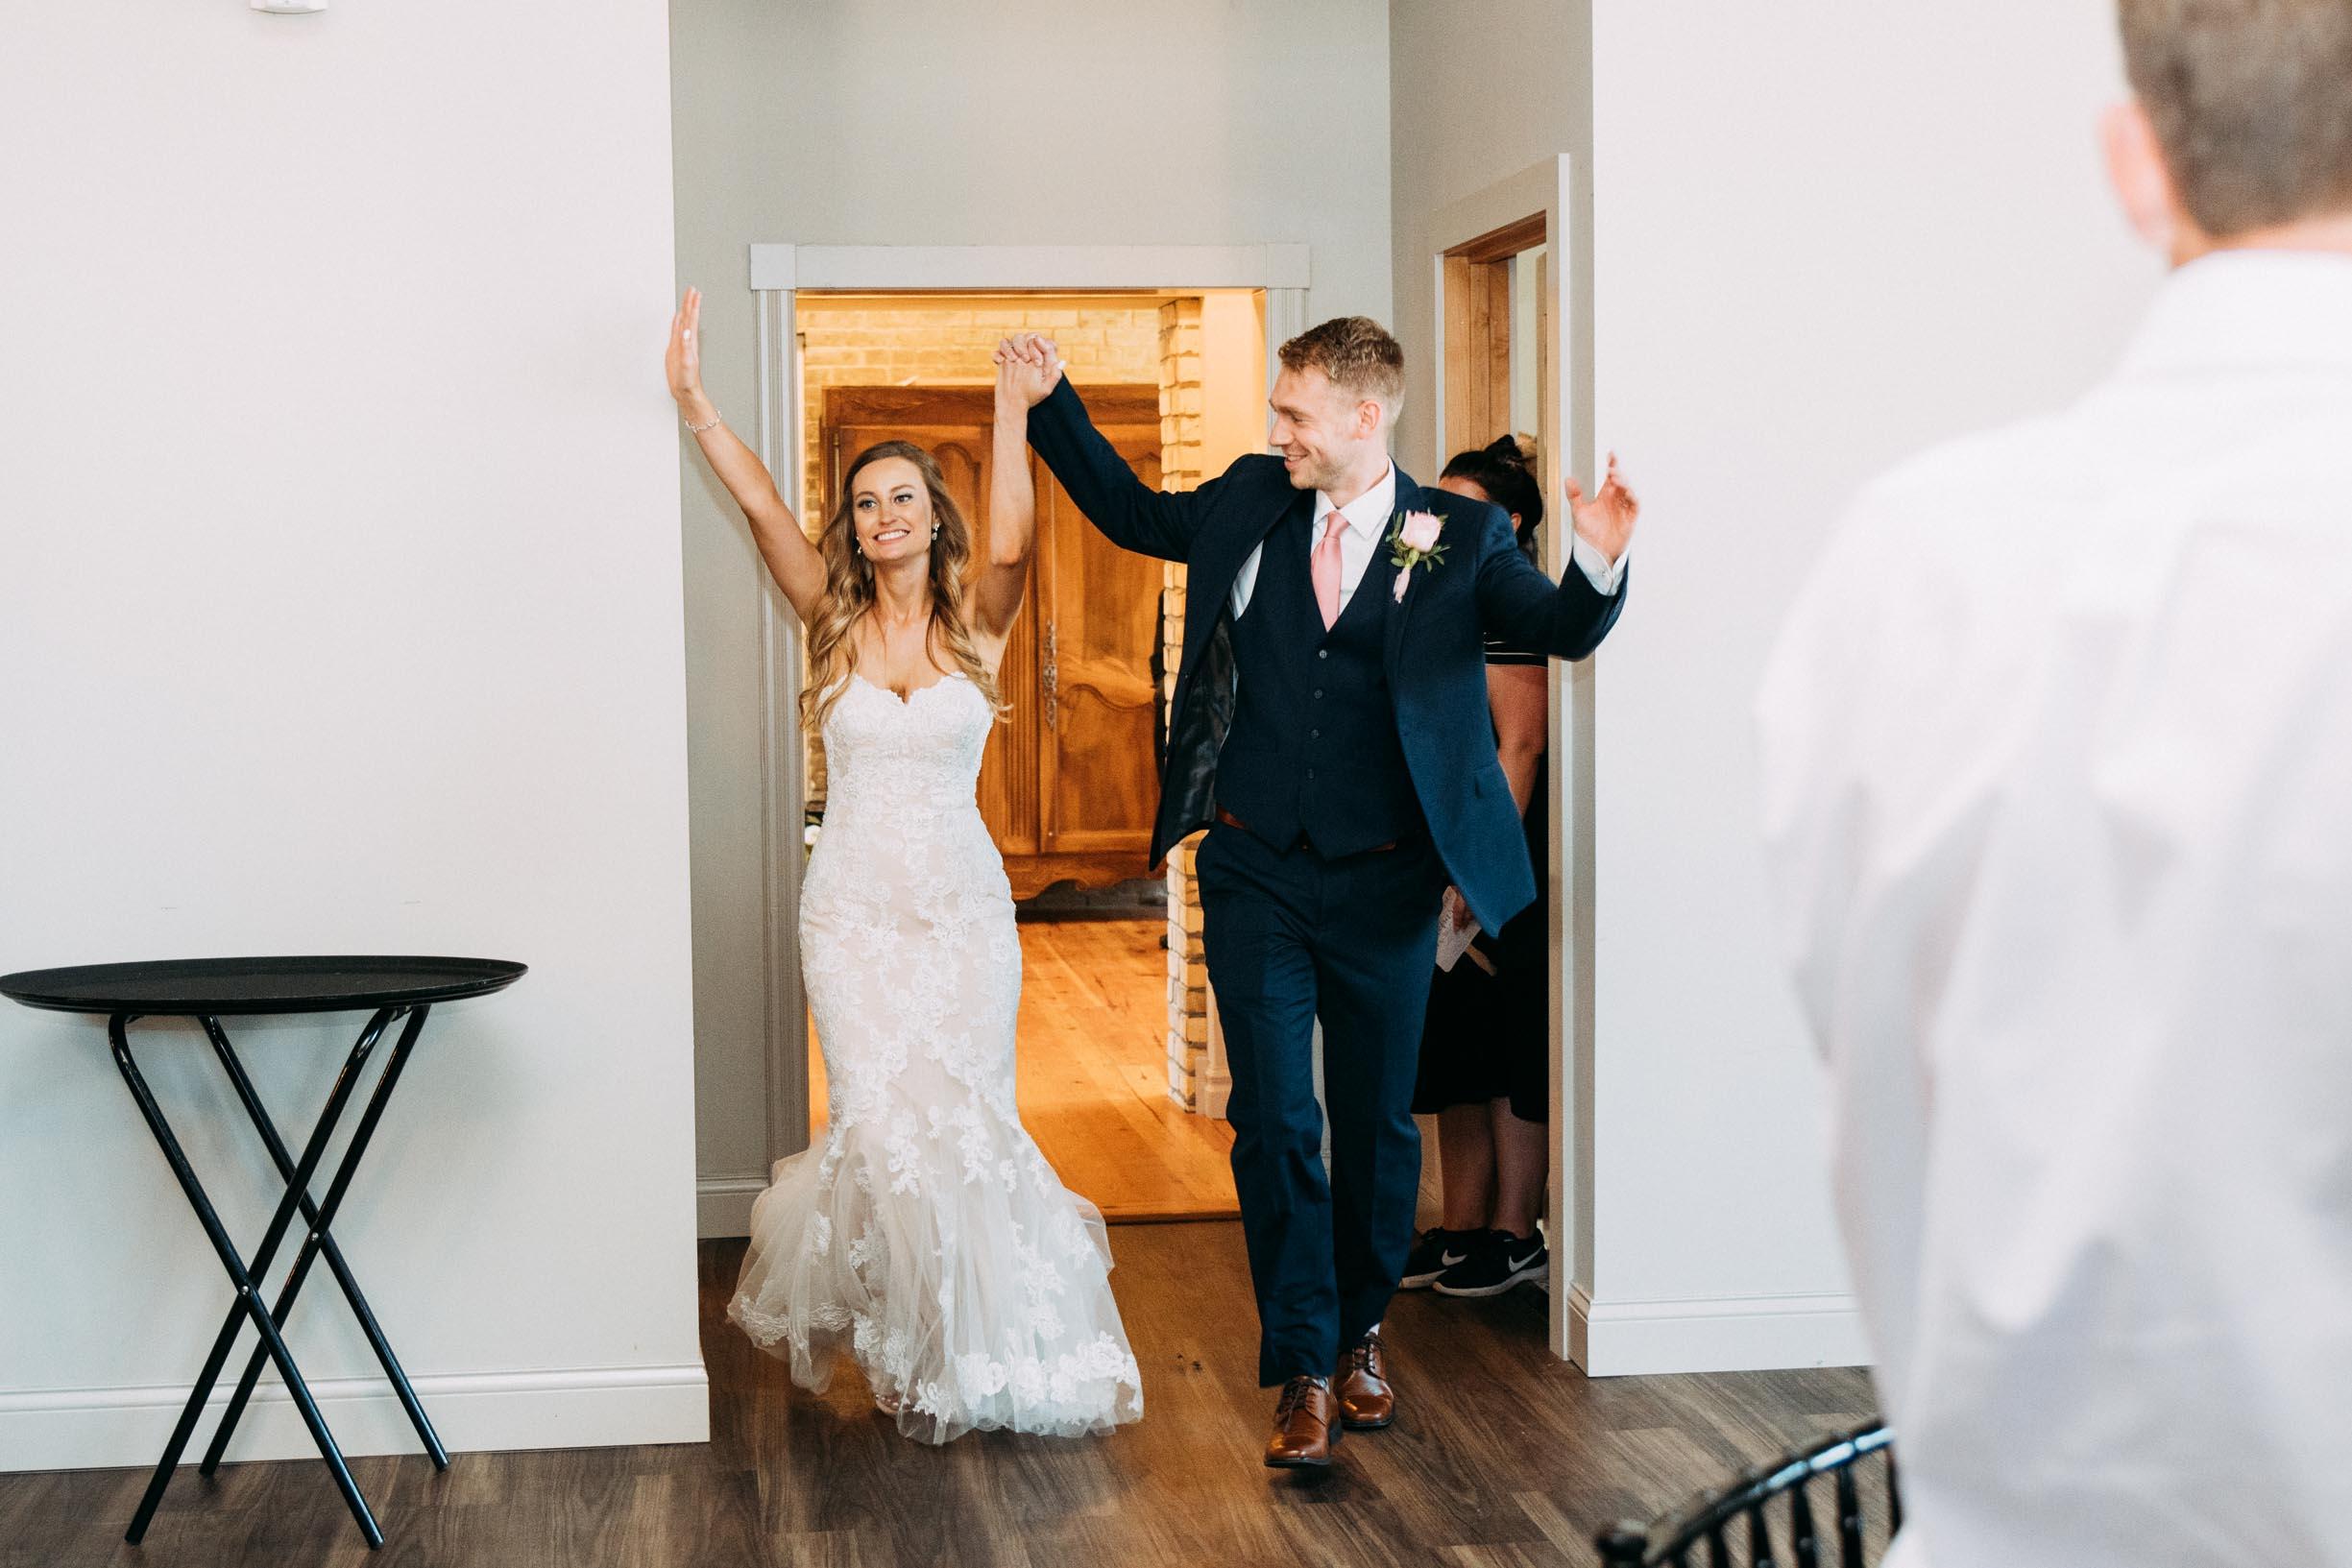 61-WeddingsattheBroz_Minnesota_WeddingBlog_Reception.jpg